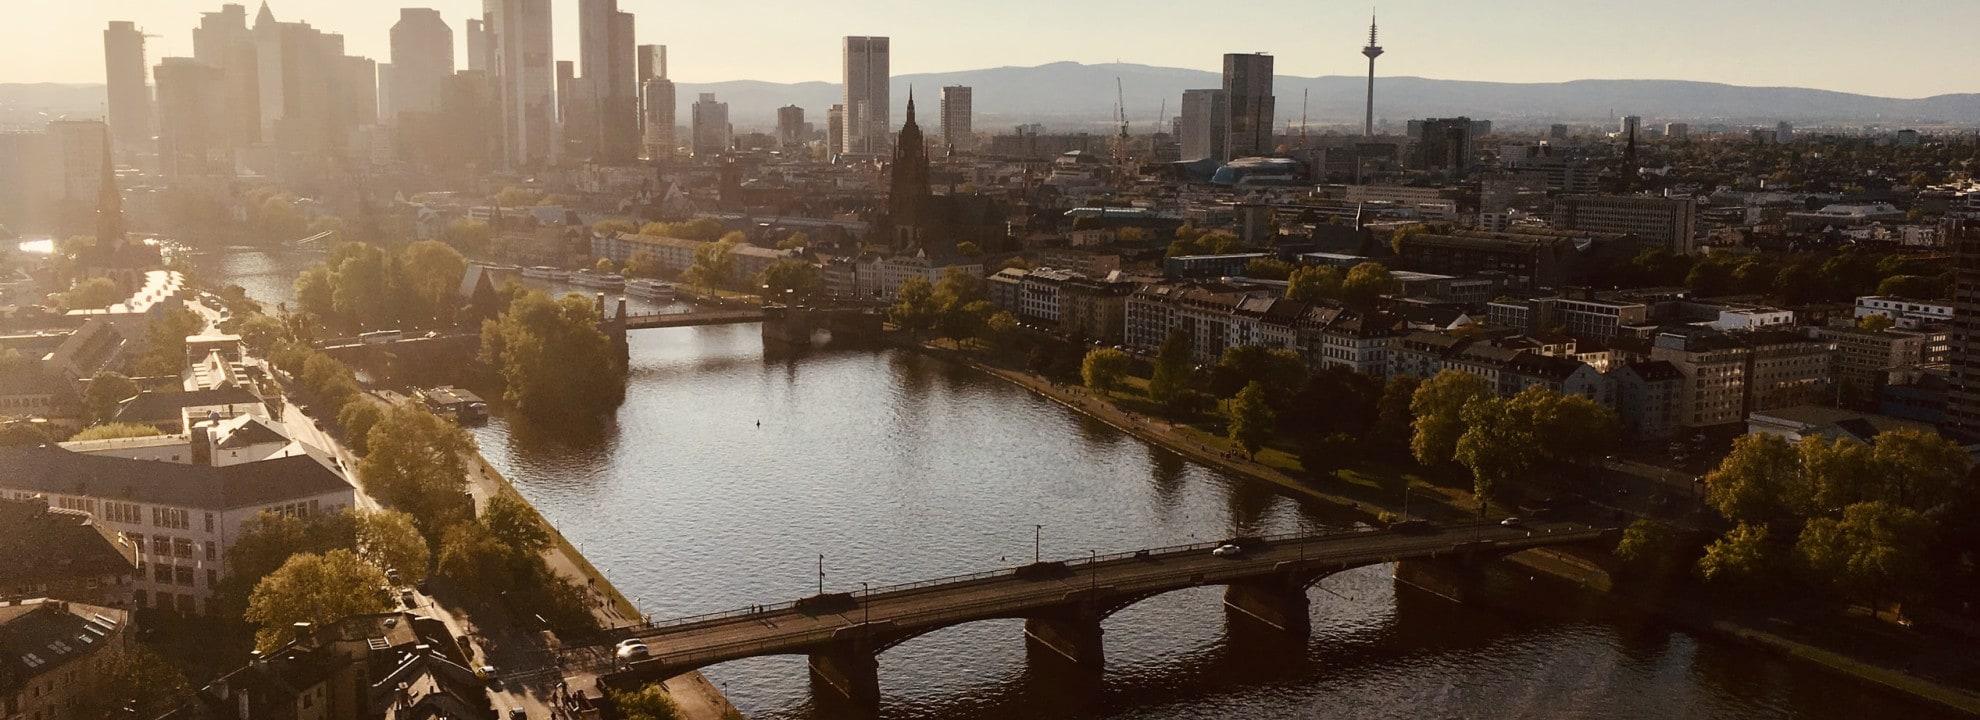 Laravel Agentur Frankfurt am Main